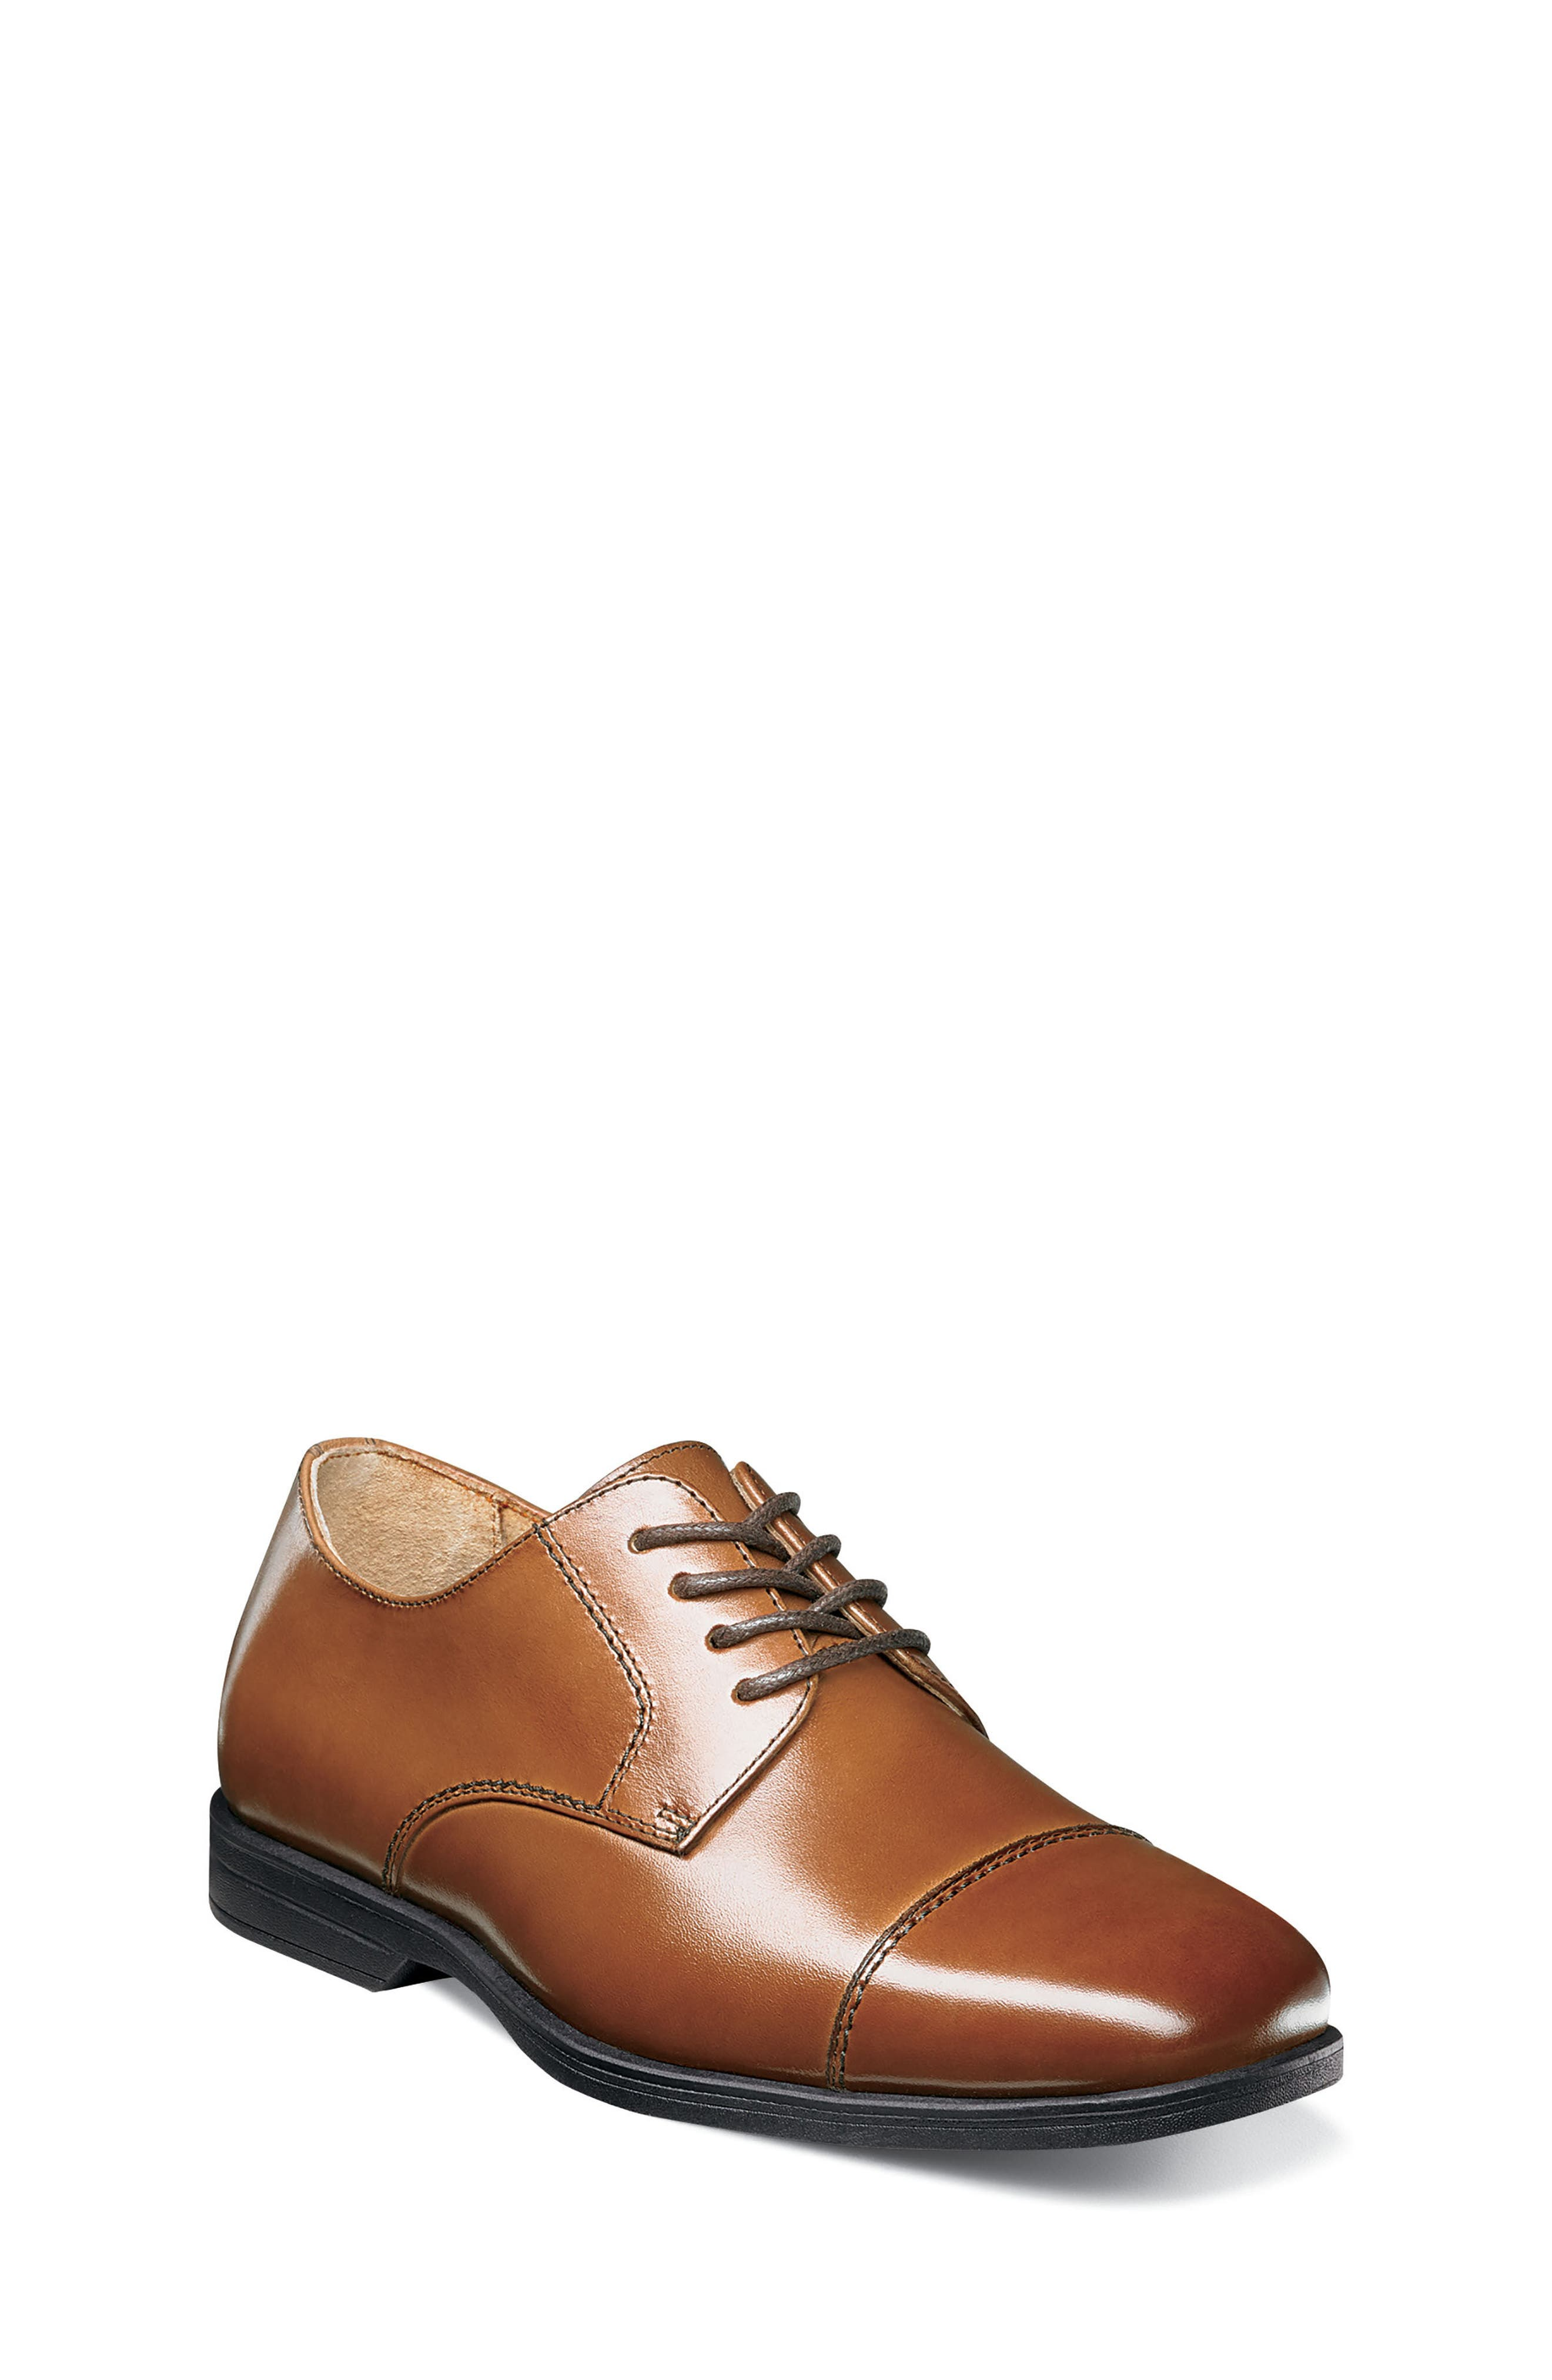 Boys' Florsheim Shoes